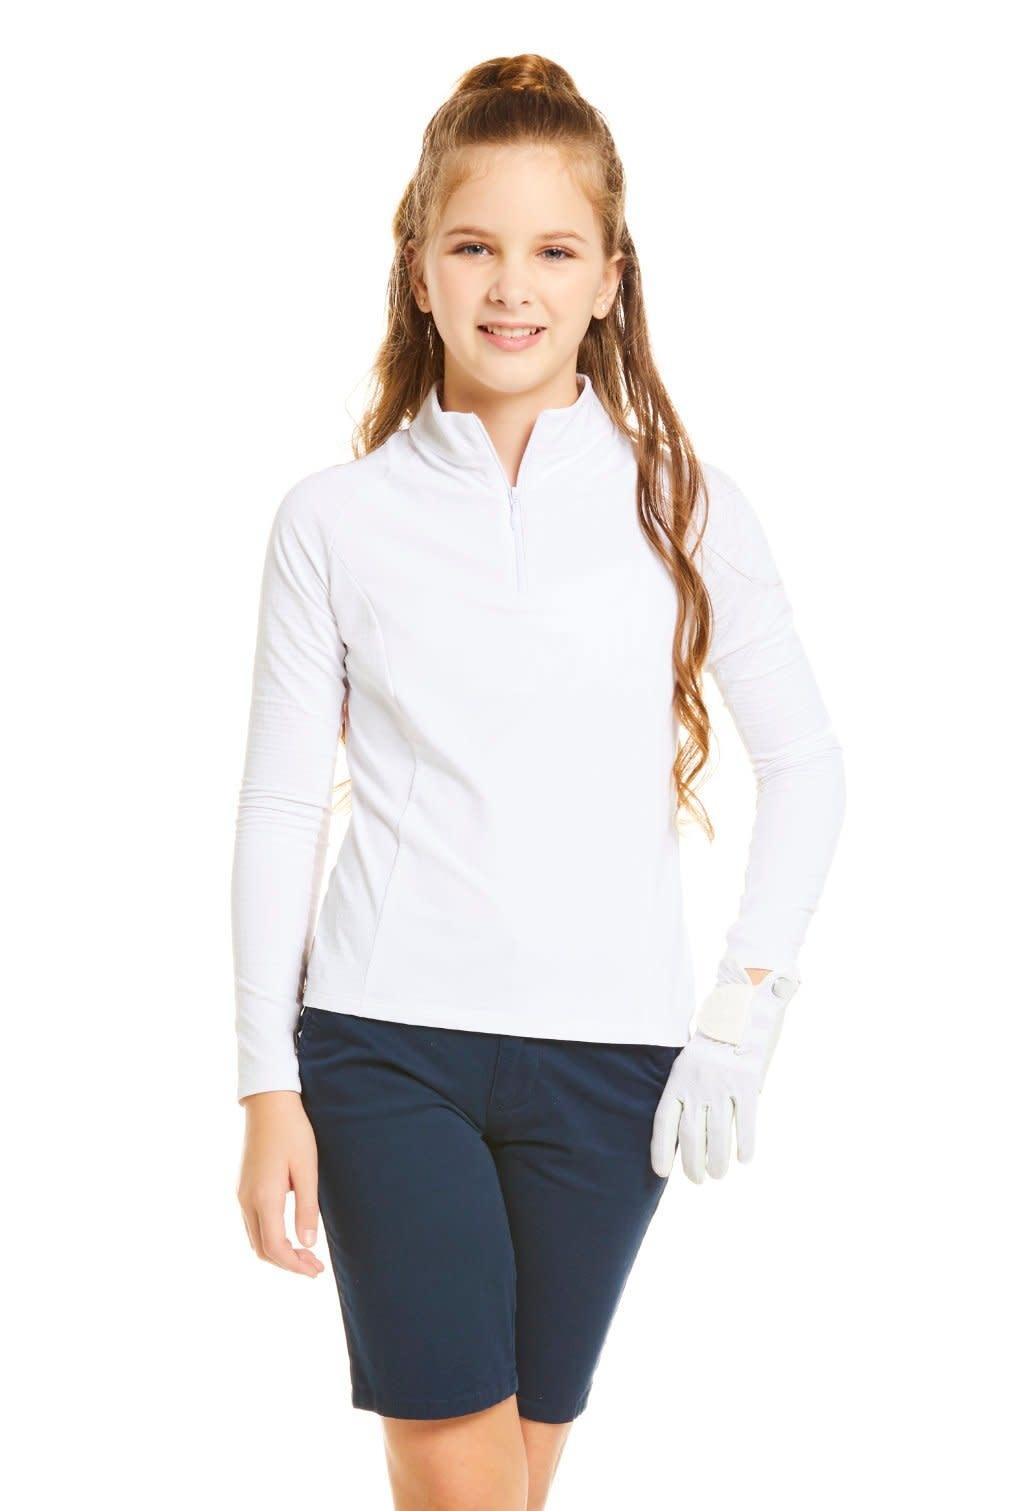 Ibkul IBKUL Solid Long Sleeve Mock Neck Top, Hot Pink